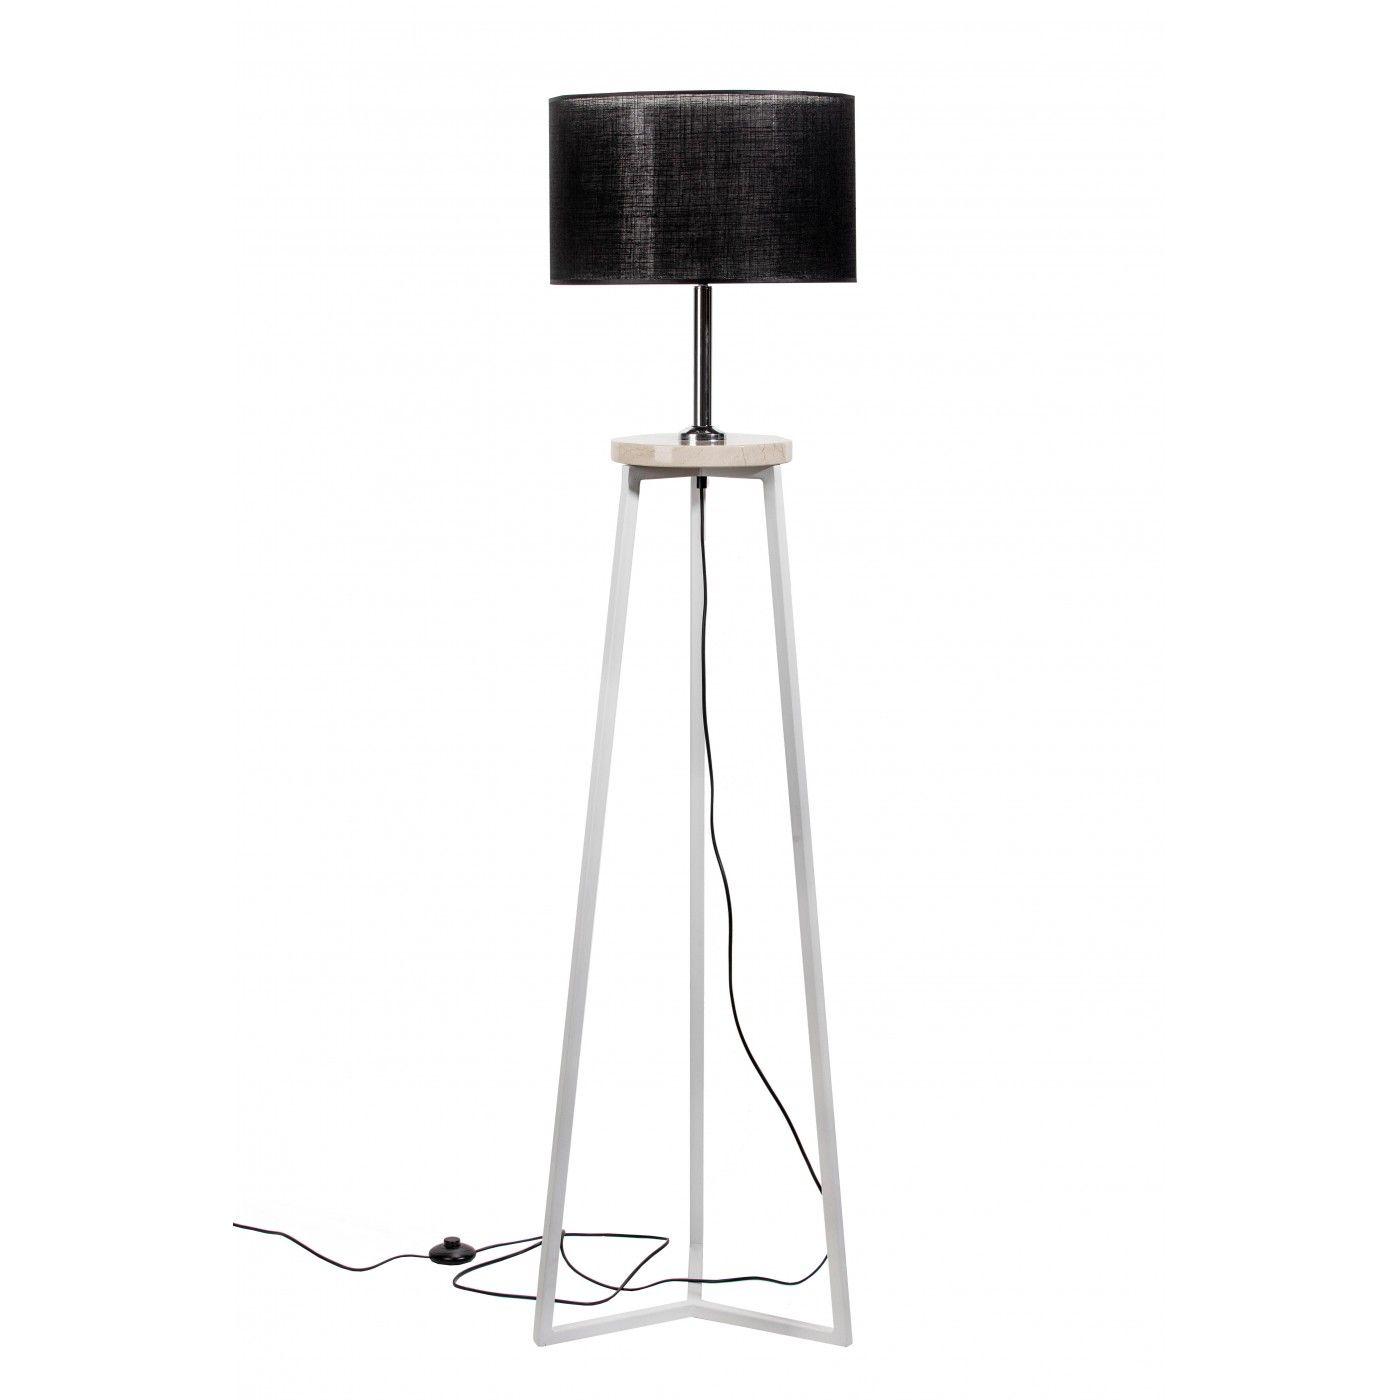 Loft Lampa Podlogowa Floki Black Marmur 167x42 Cm Tb400 House Design Lamp Design